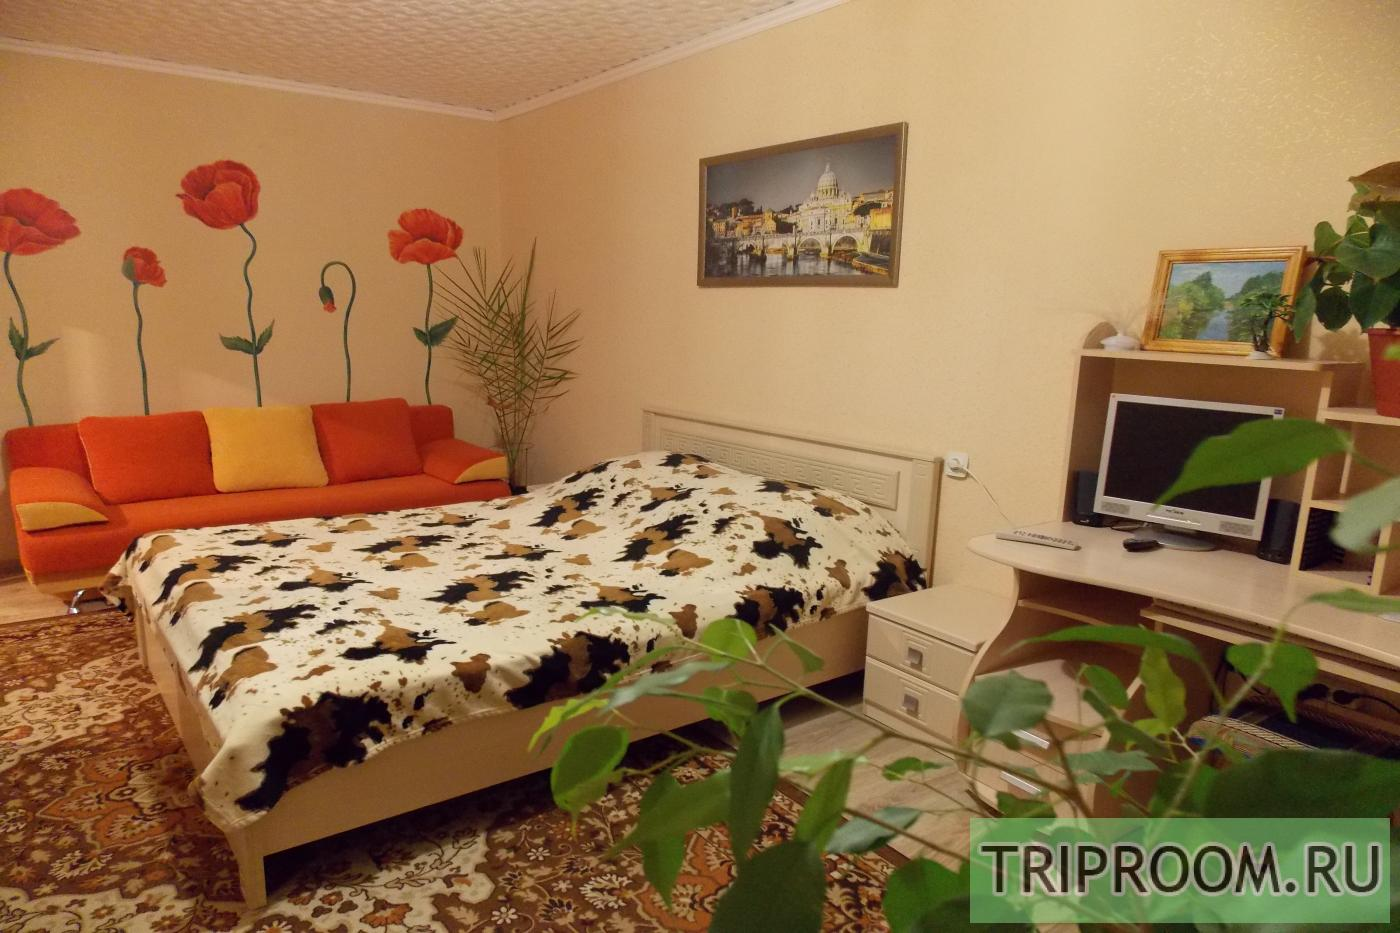 1-комнатная квартира посуточно (вариант № 15993), ул. Московский проспект, фото № 6